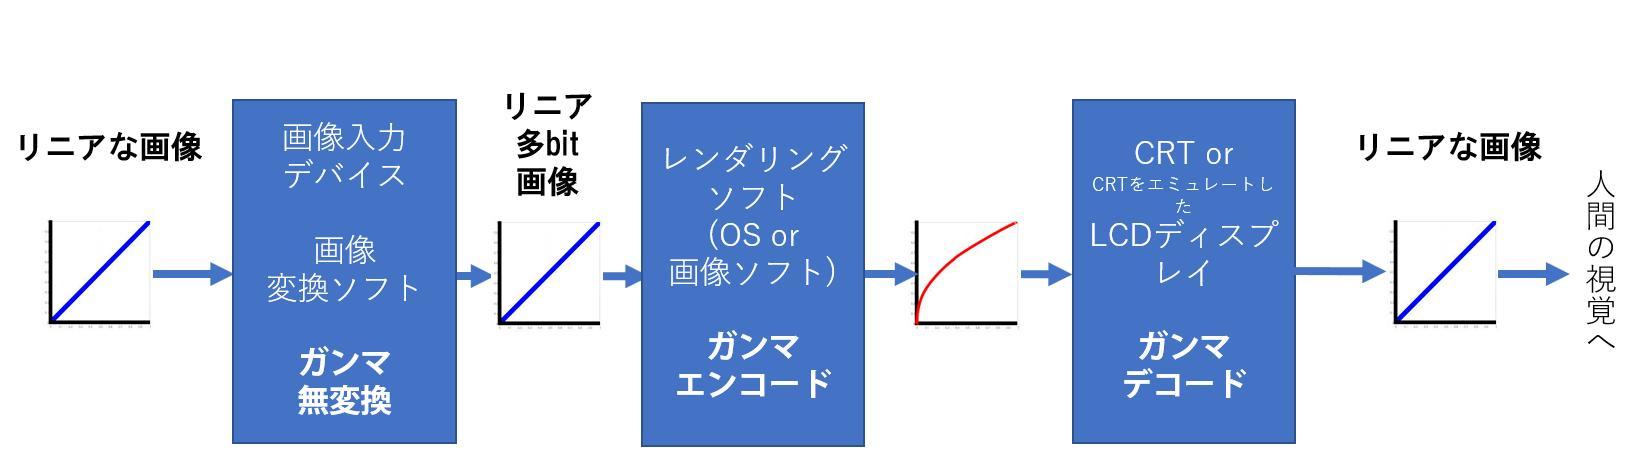 f:id:yasuo_ssi:20201106113230j:plain